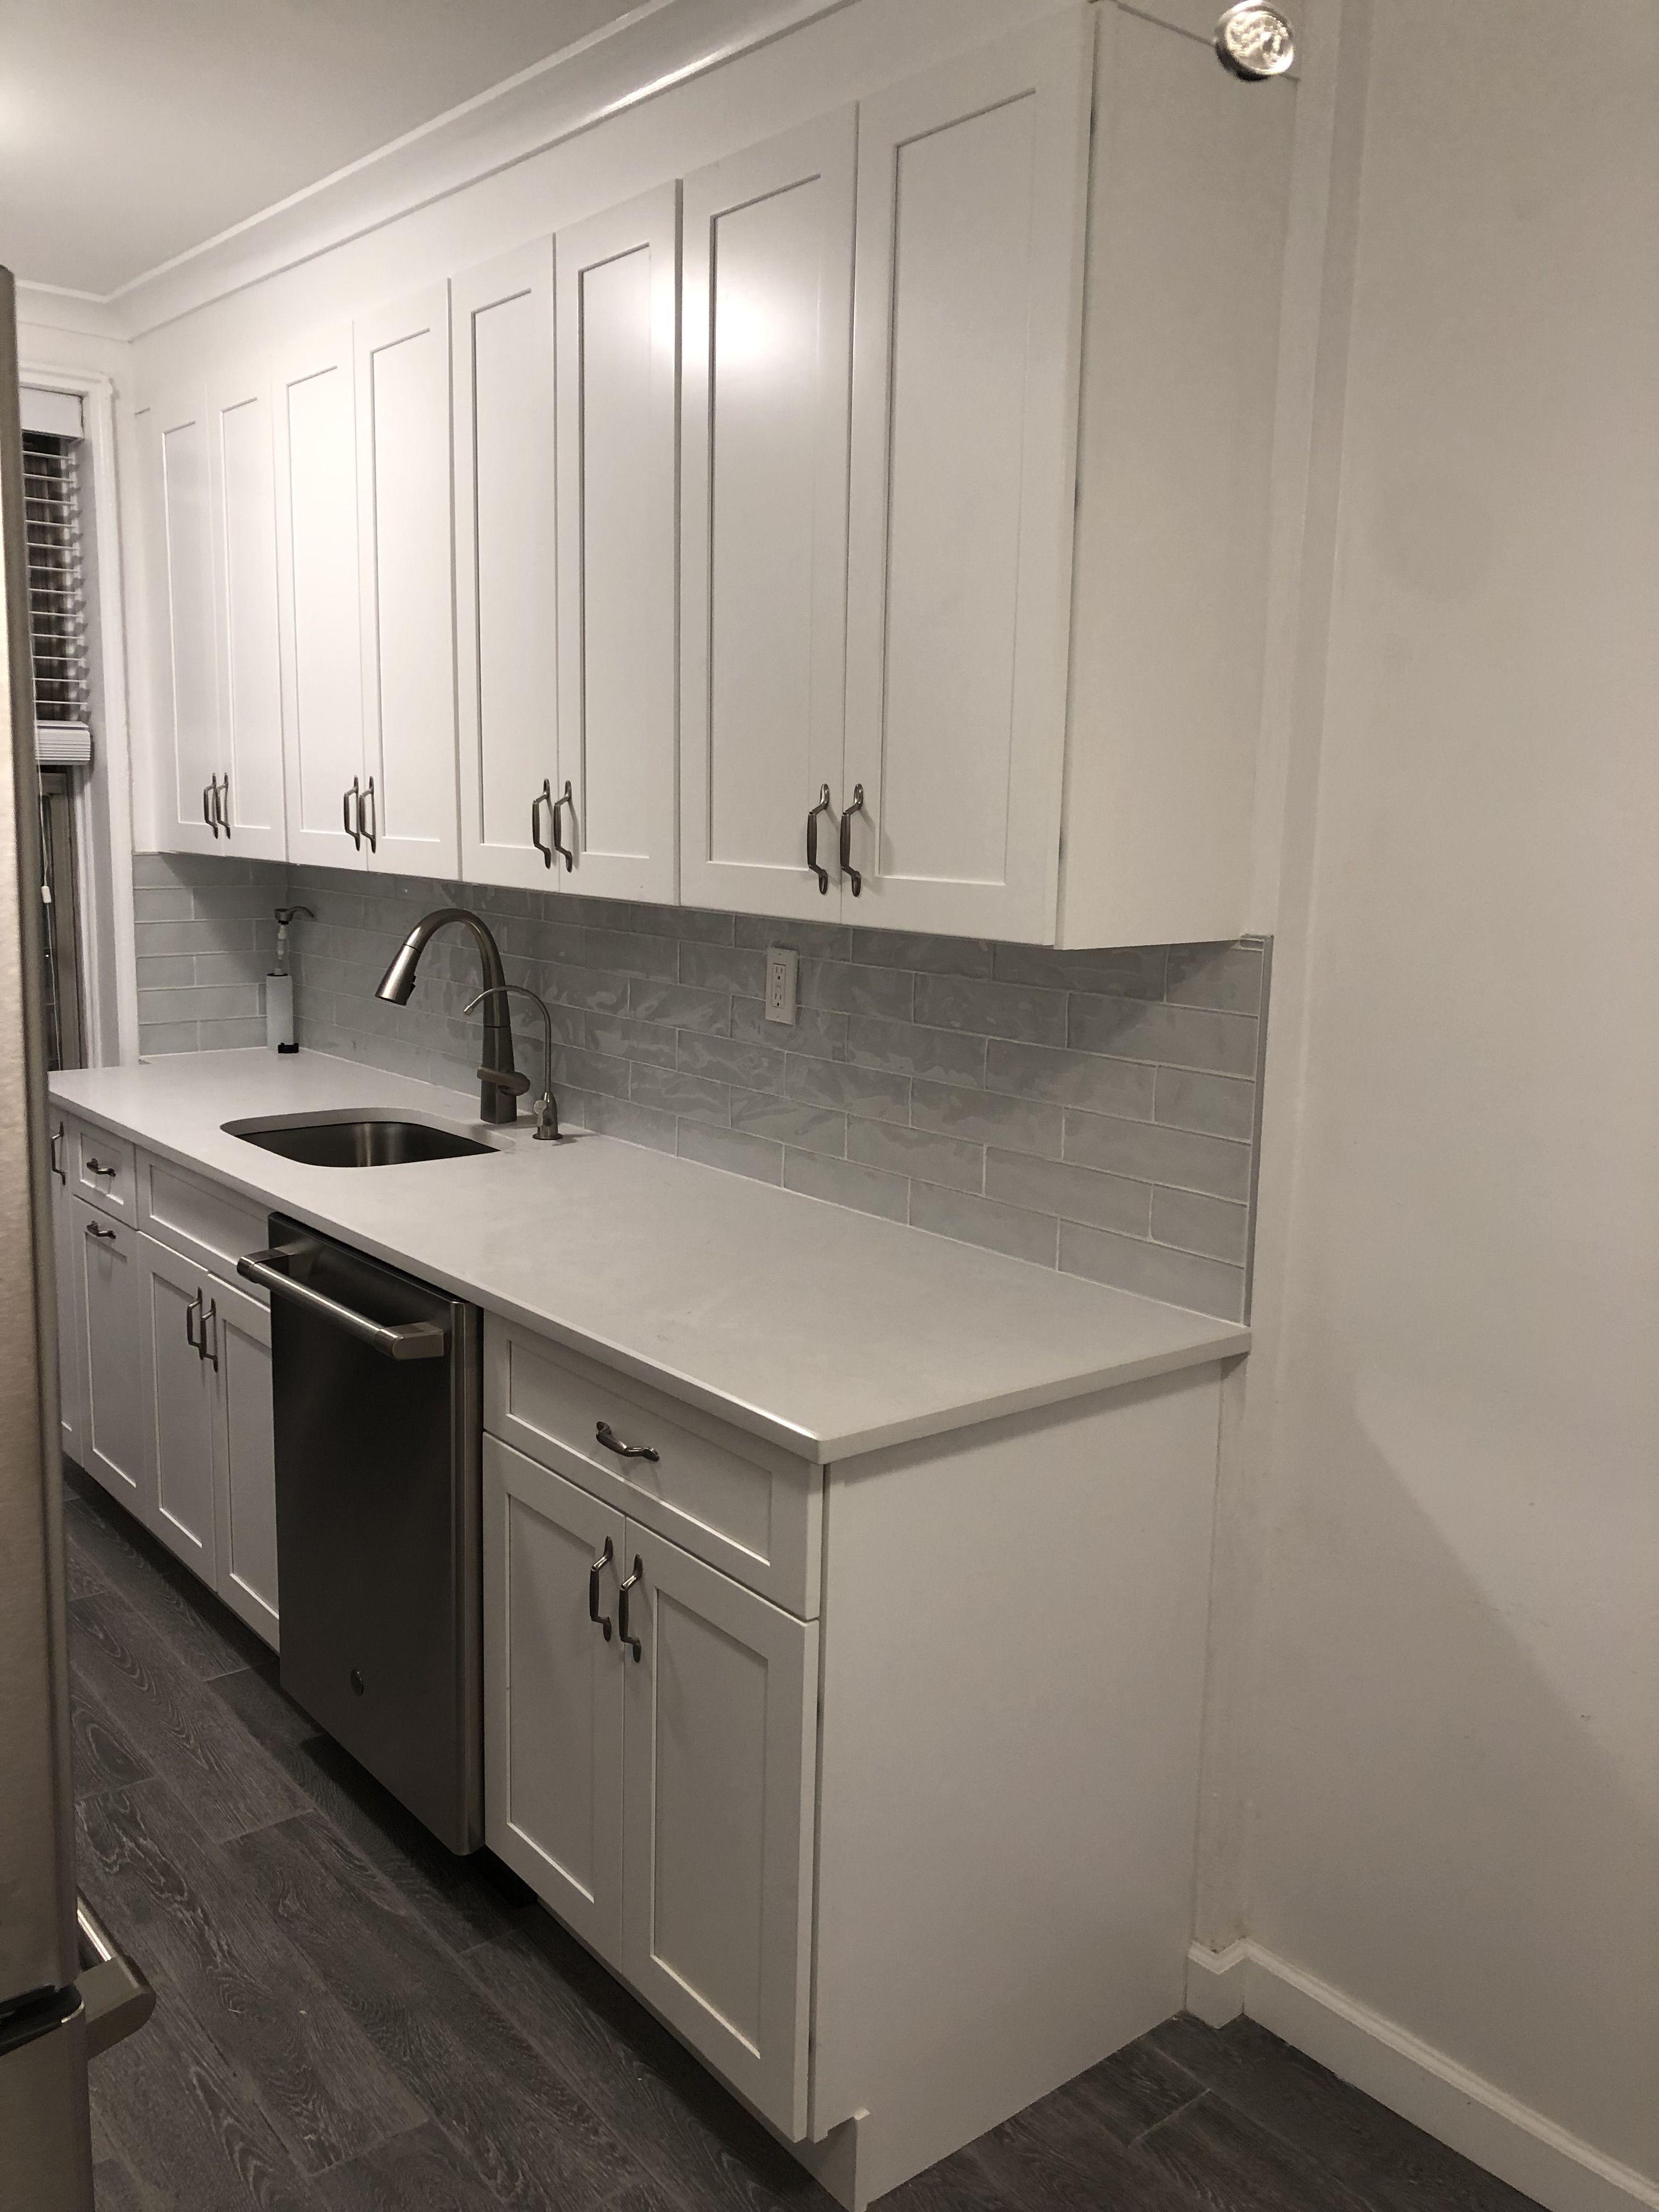 Yonkers Ny Kitchen Renovation Kitchen Renovation Kitchen And Bath Design Kitchen